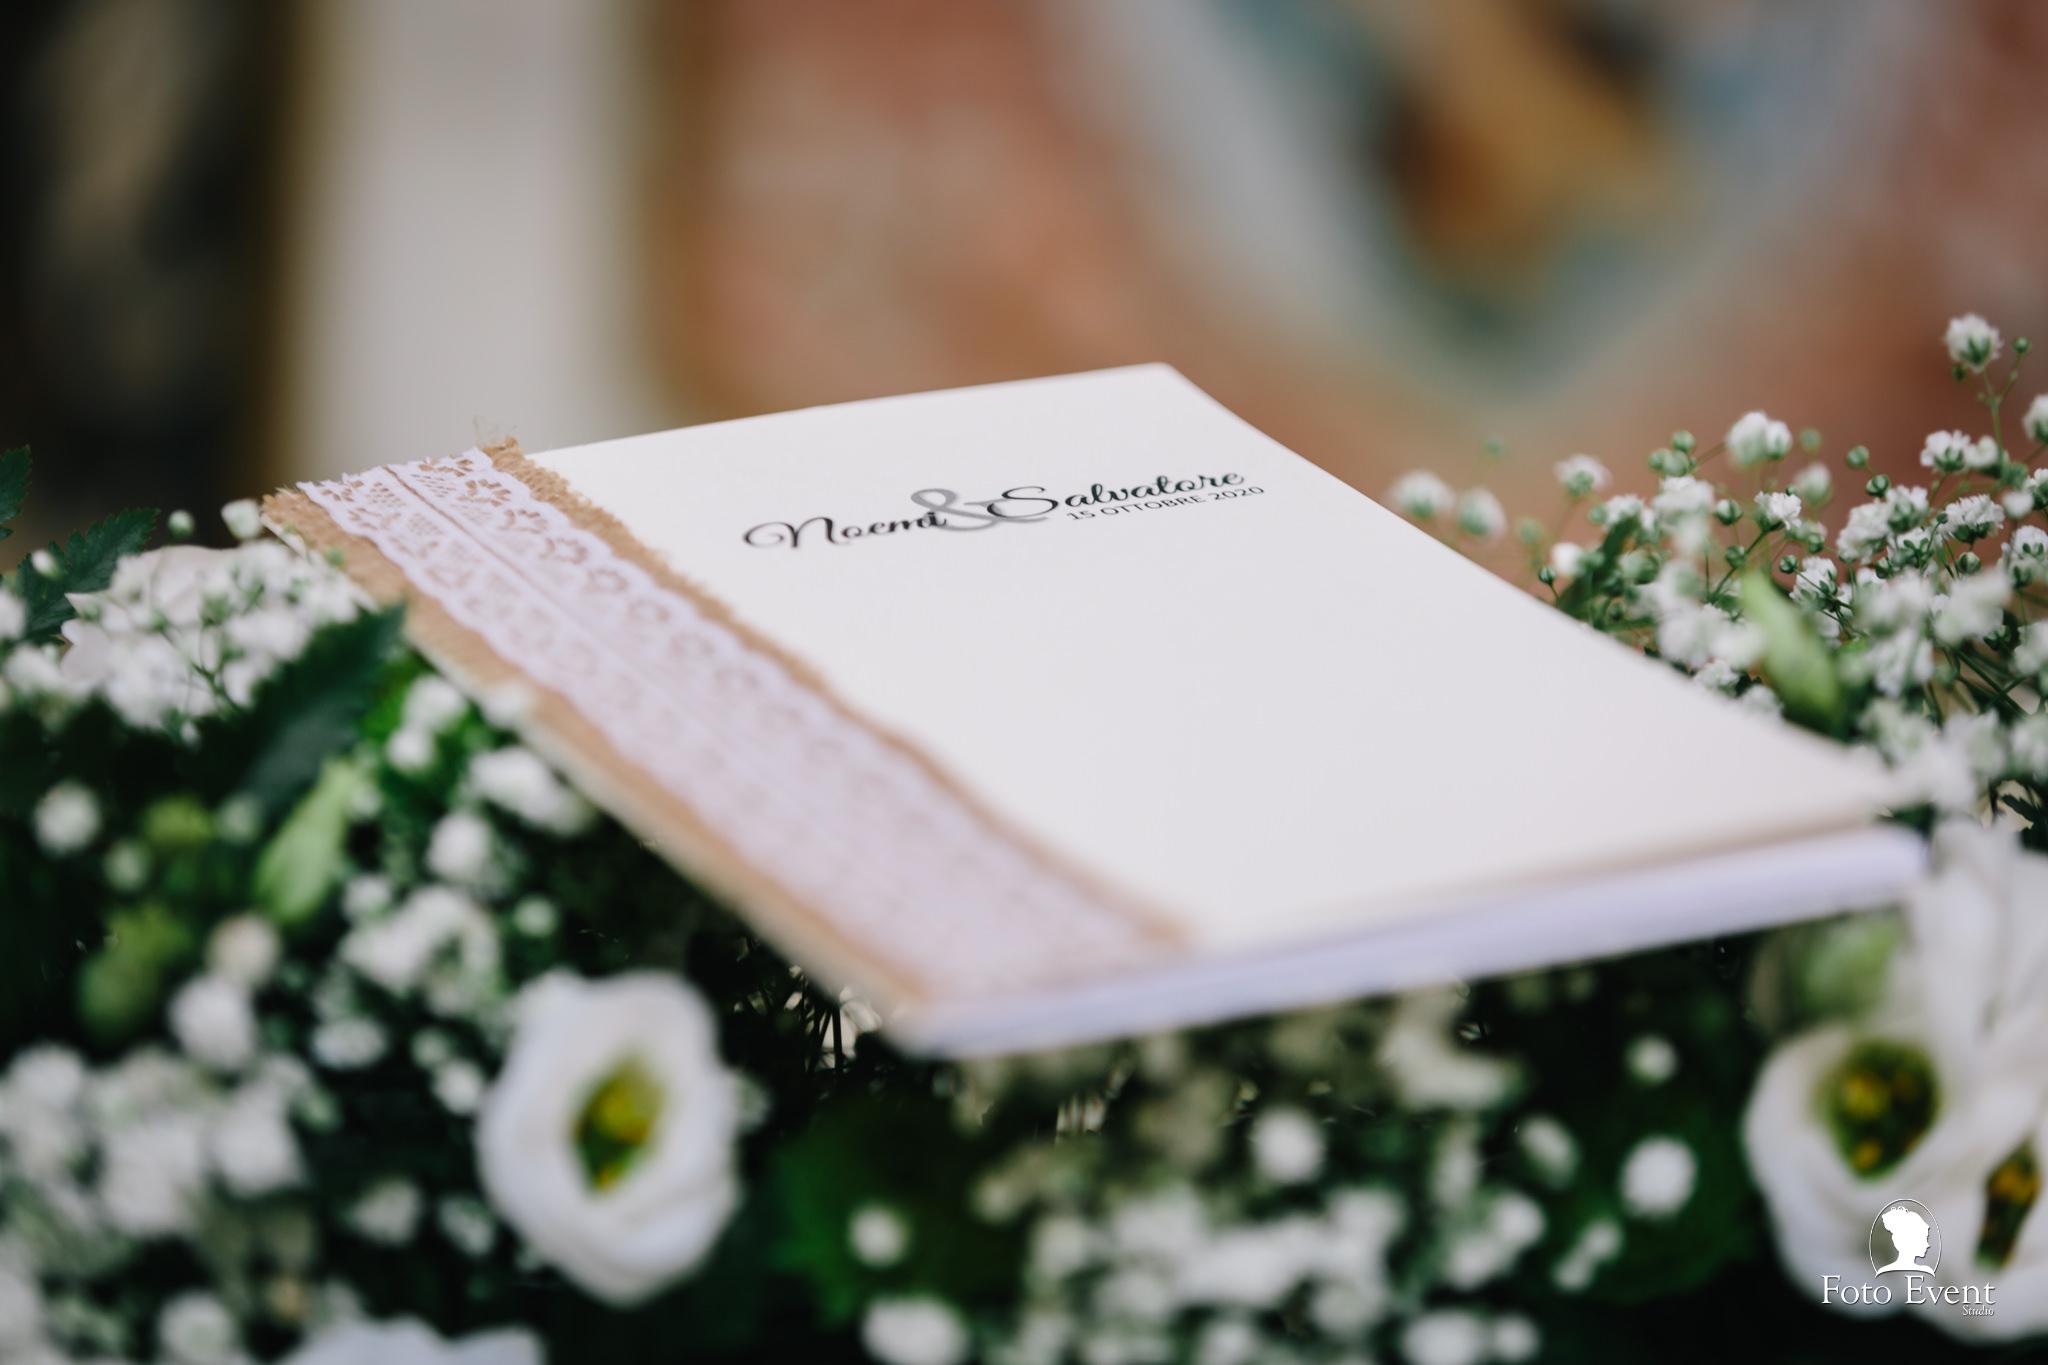 033-2020-10-15-Matrimonio-Noemi-e-Salvatore-Paterno-zoom-373